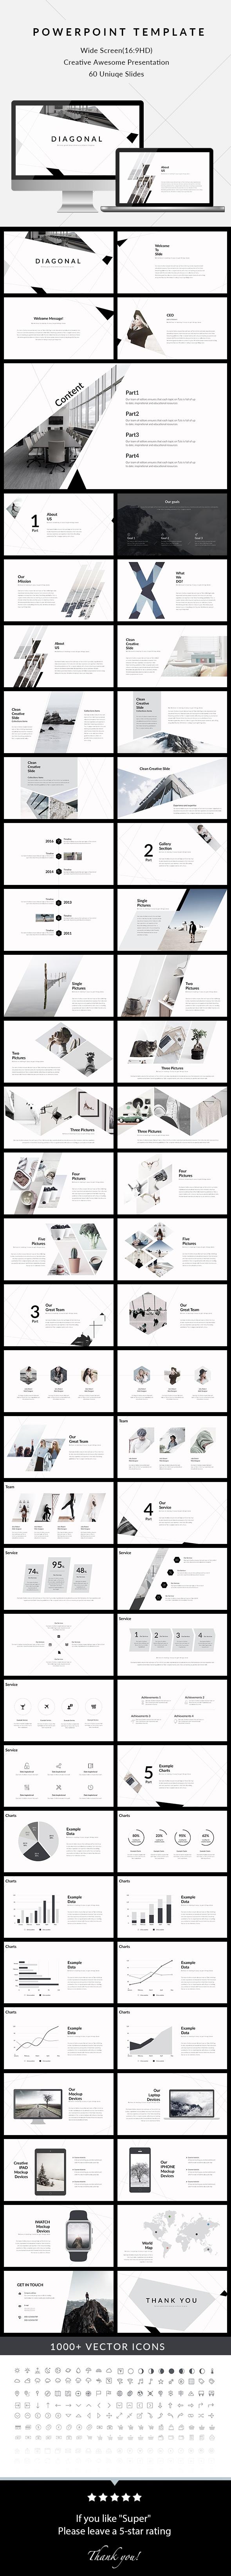 Diagonal - Clean & Creative PowerPoint Presentation